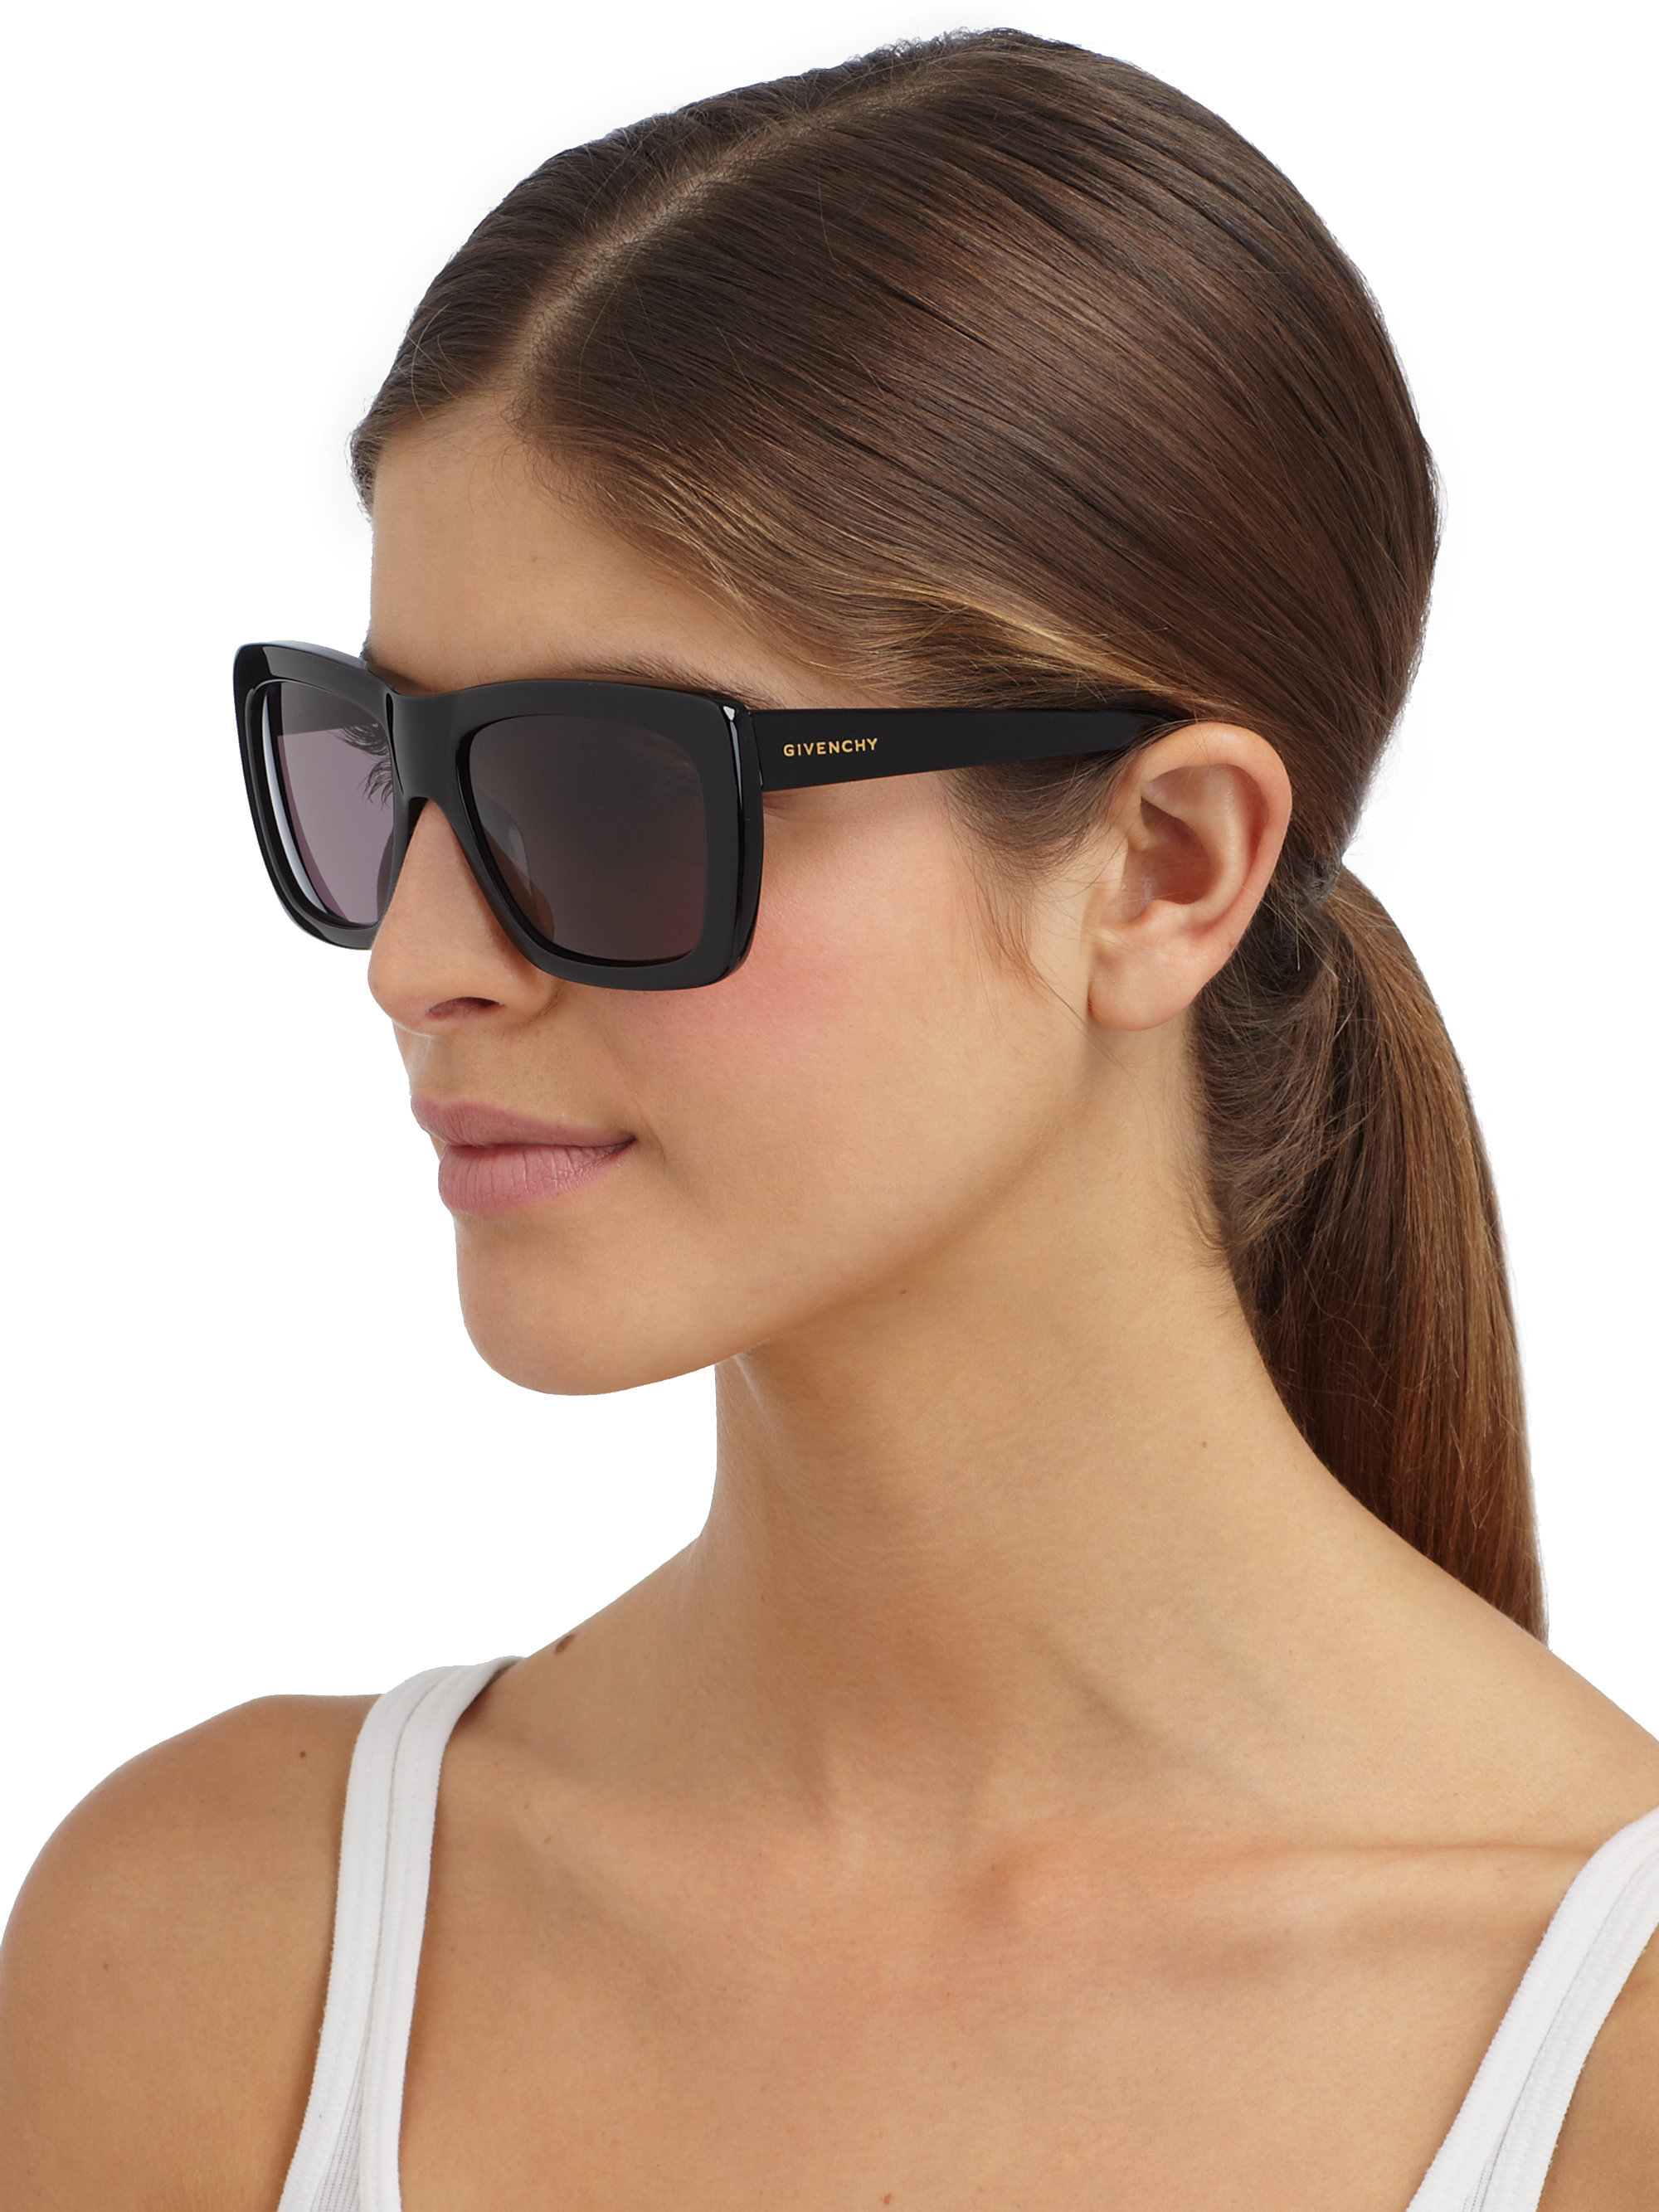 Lyst Givenchy Oversized Wayfarer Sunglasses In Black